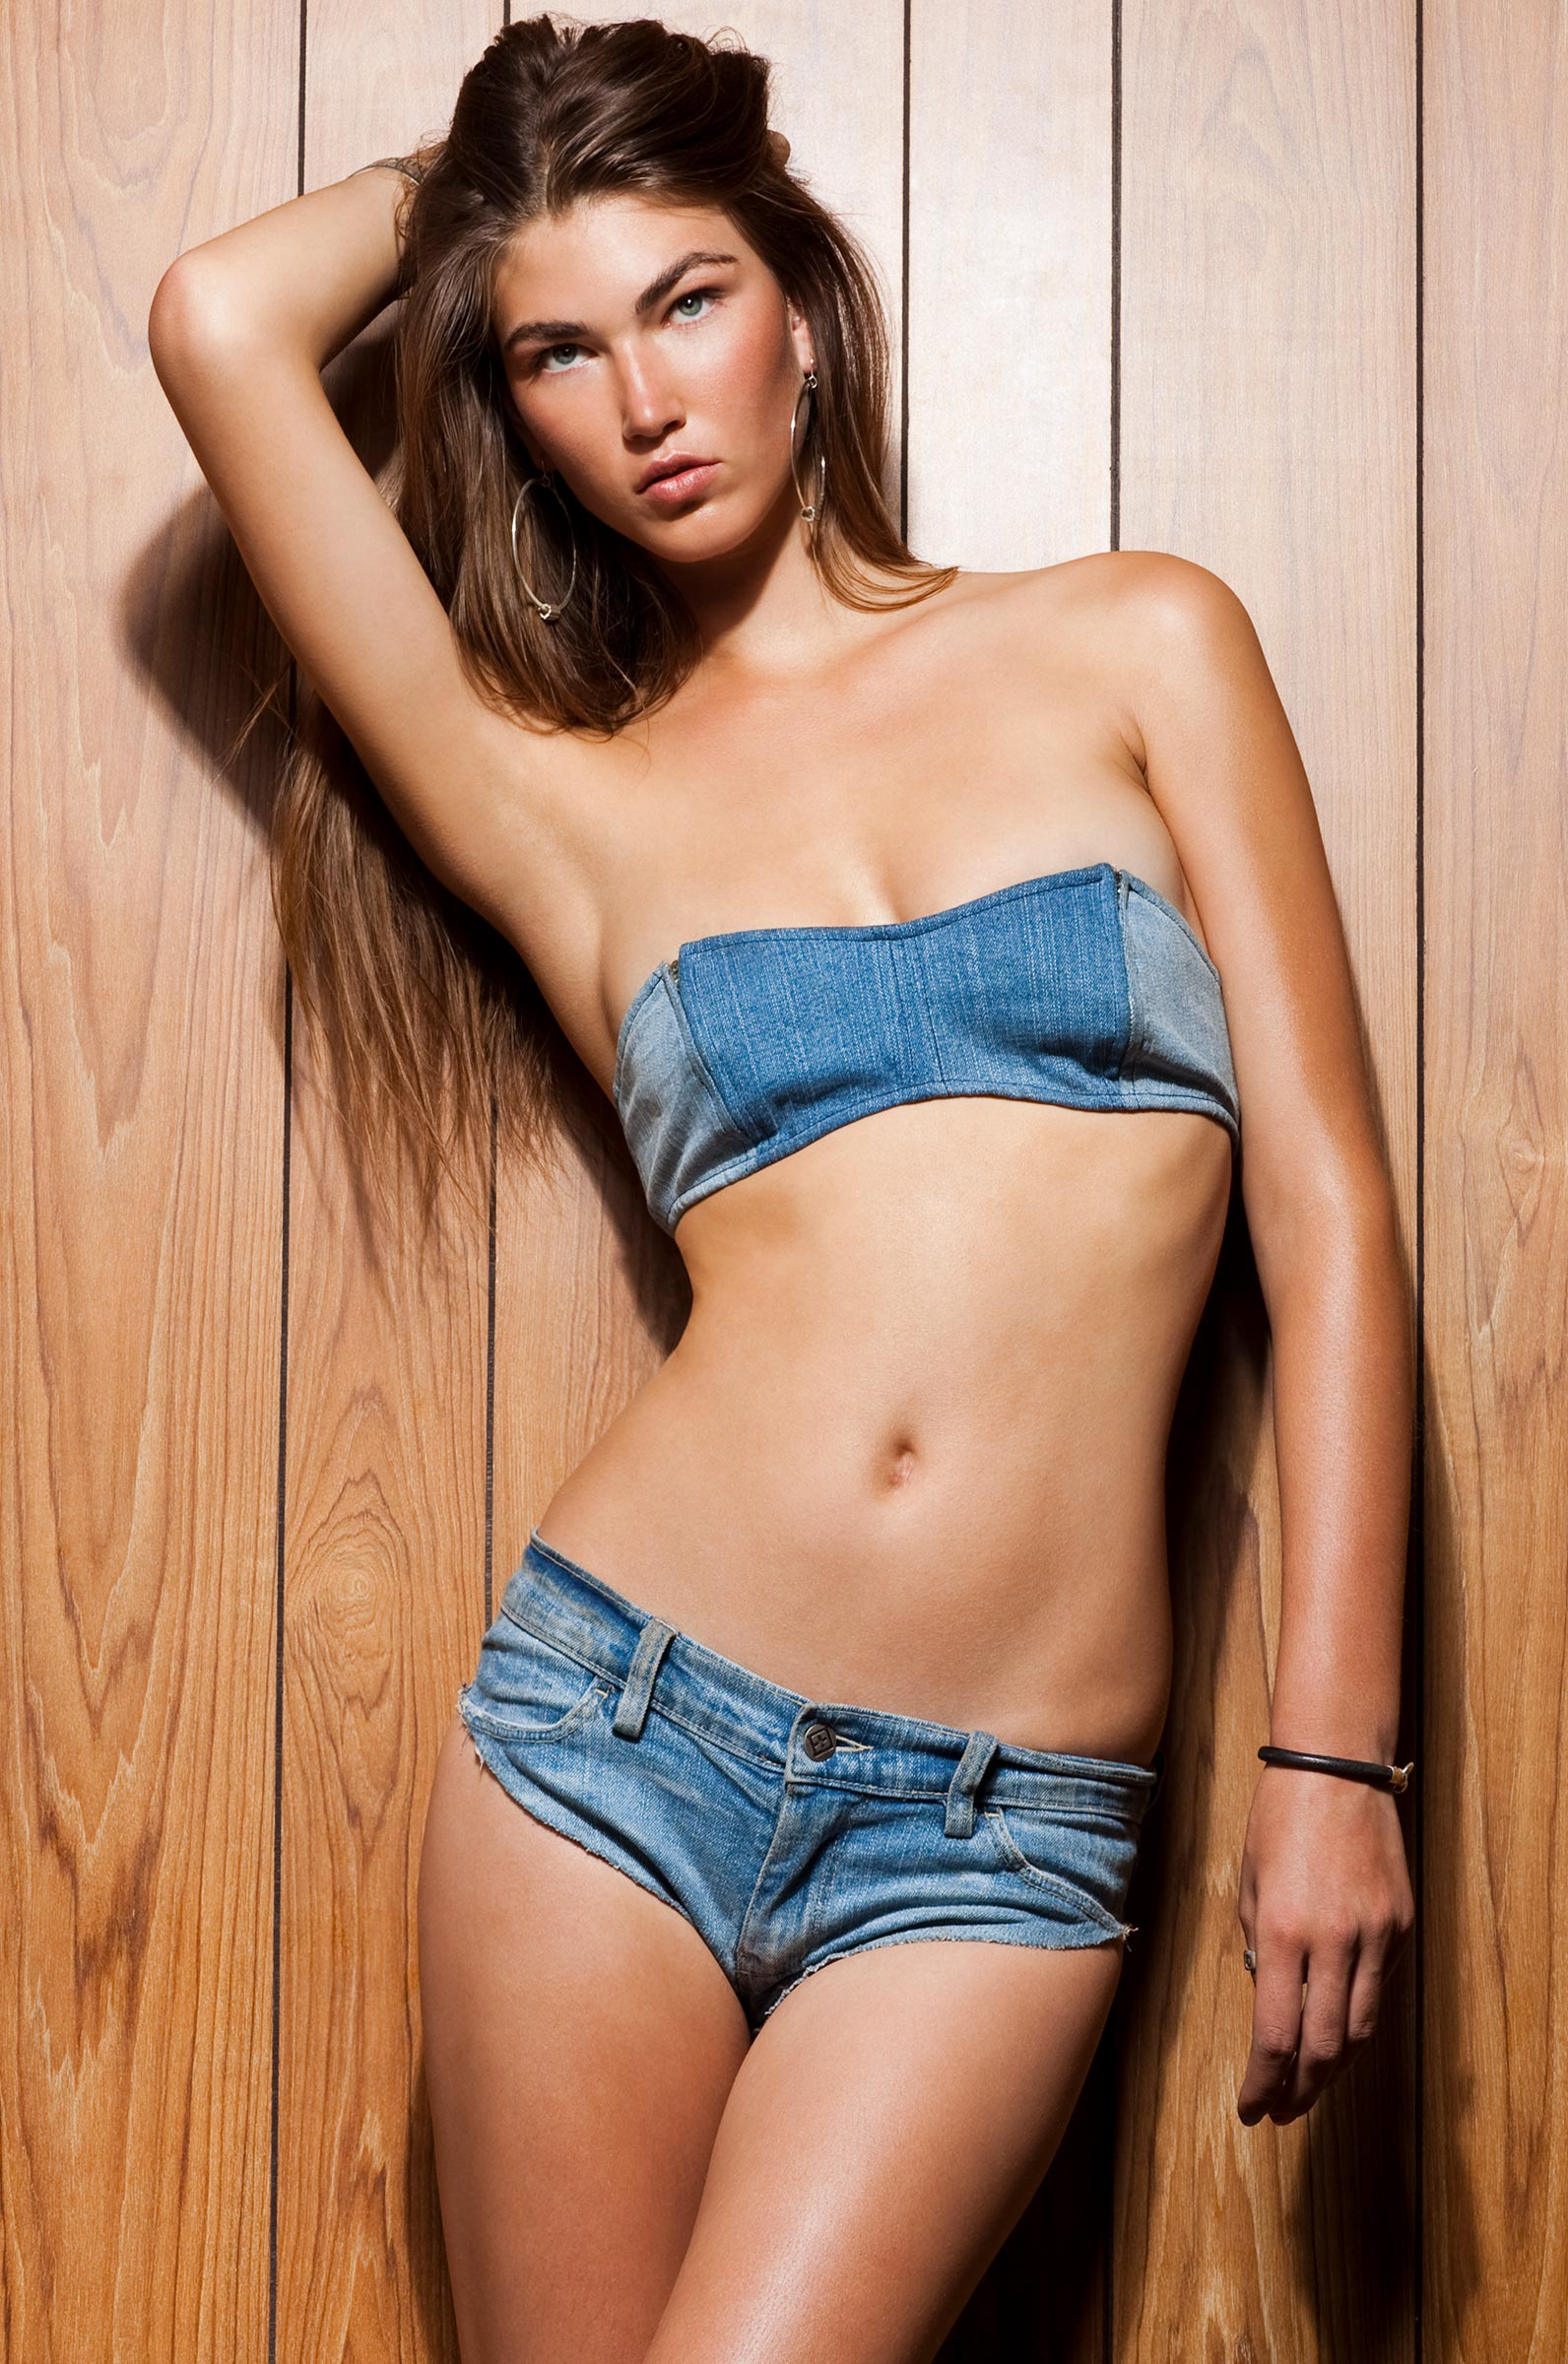 woman in denim bikini leaning against wood panel wall